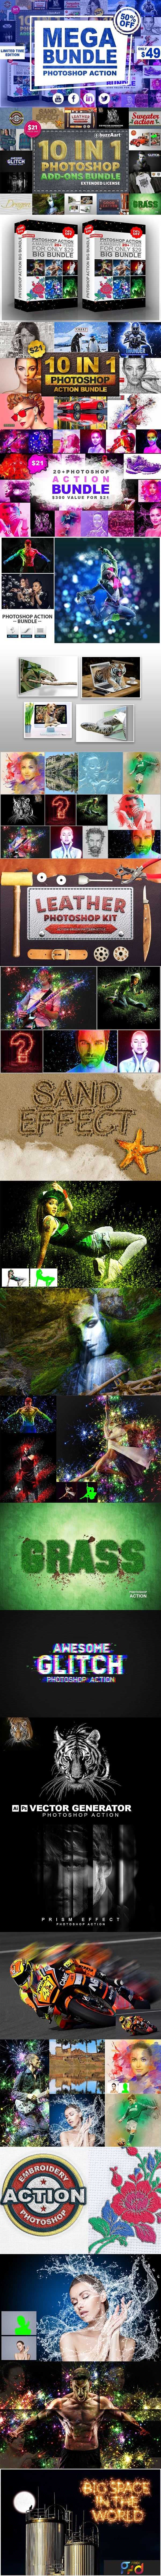 1806205 Mega Bundle Photoshop Action 2555731 1